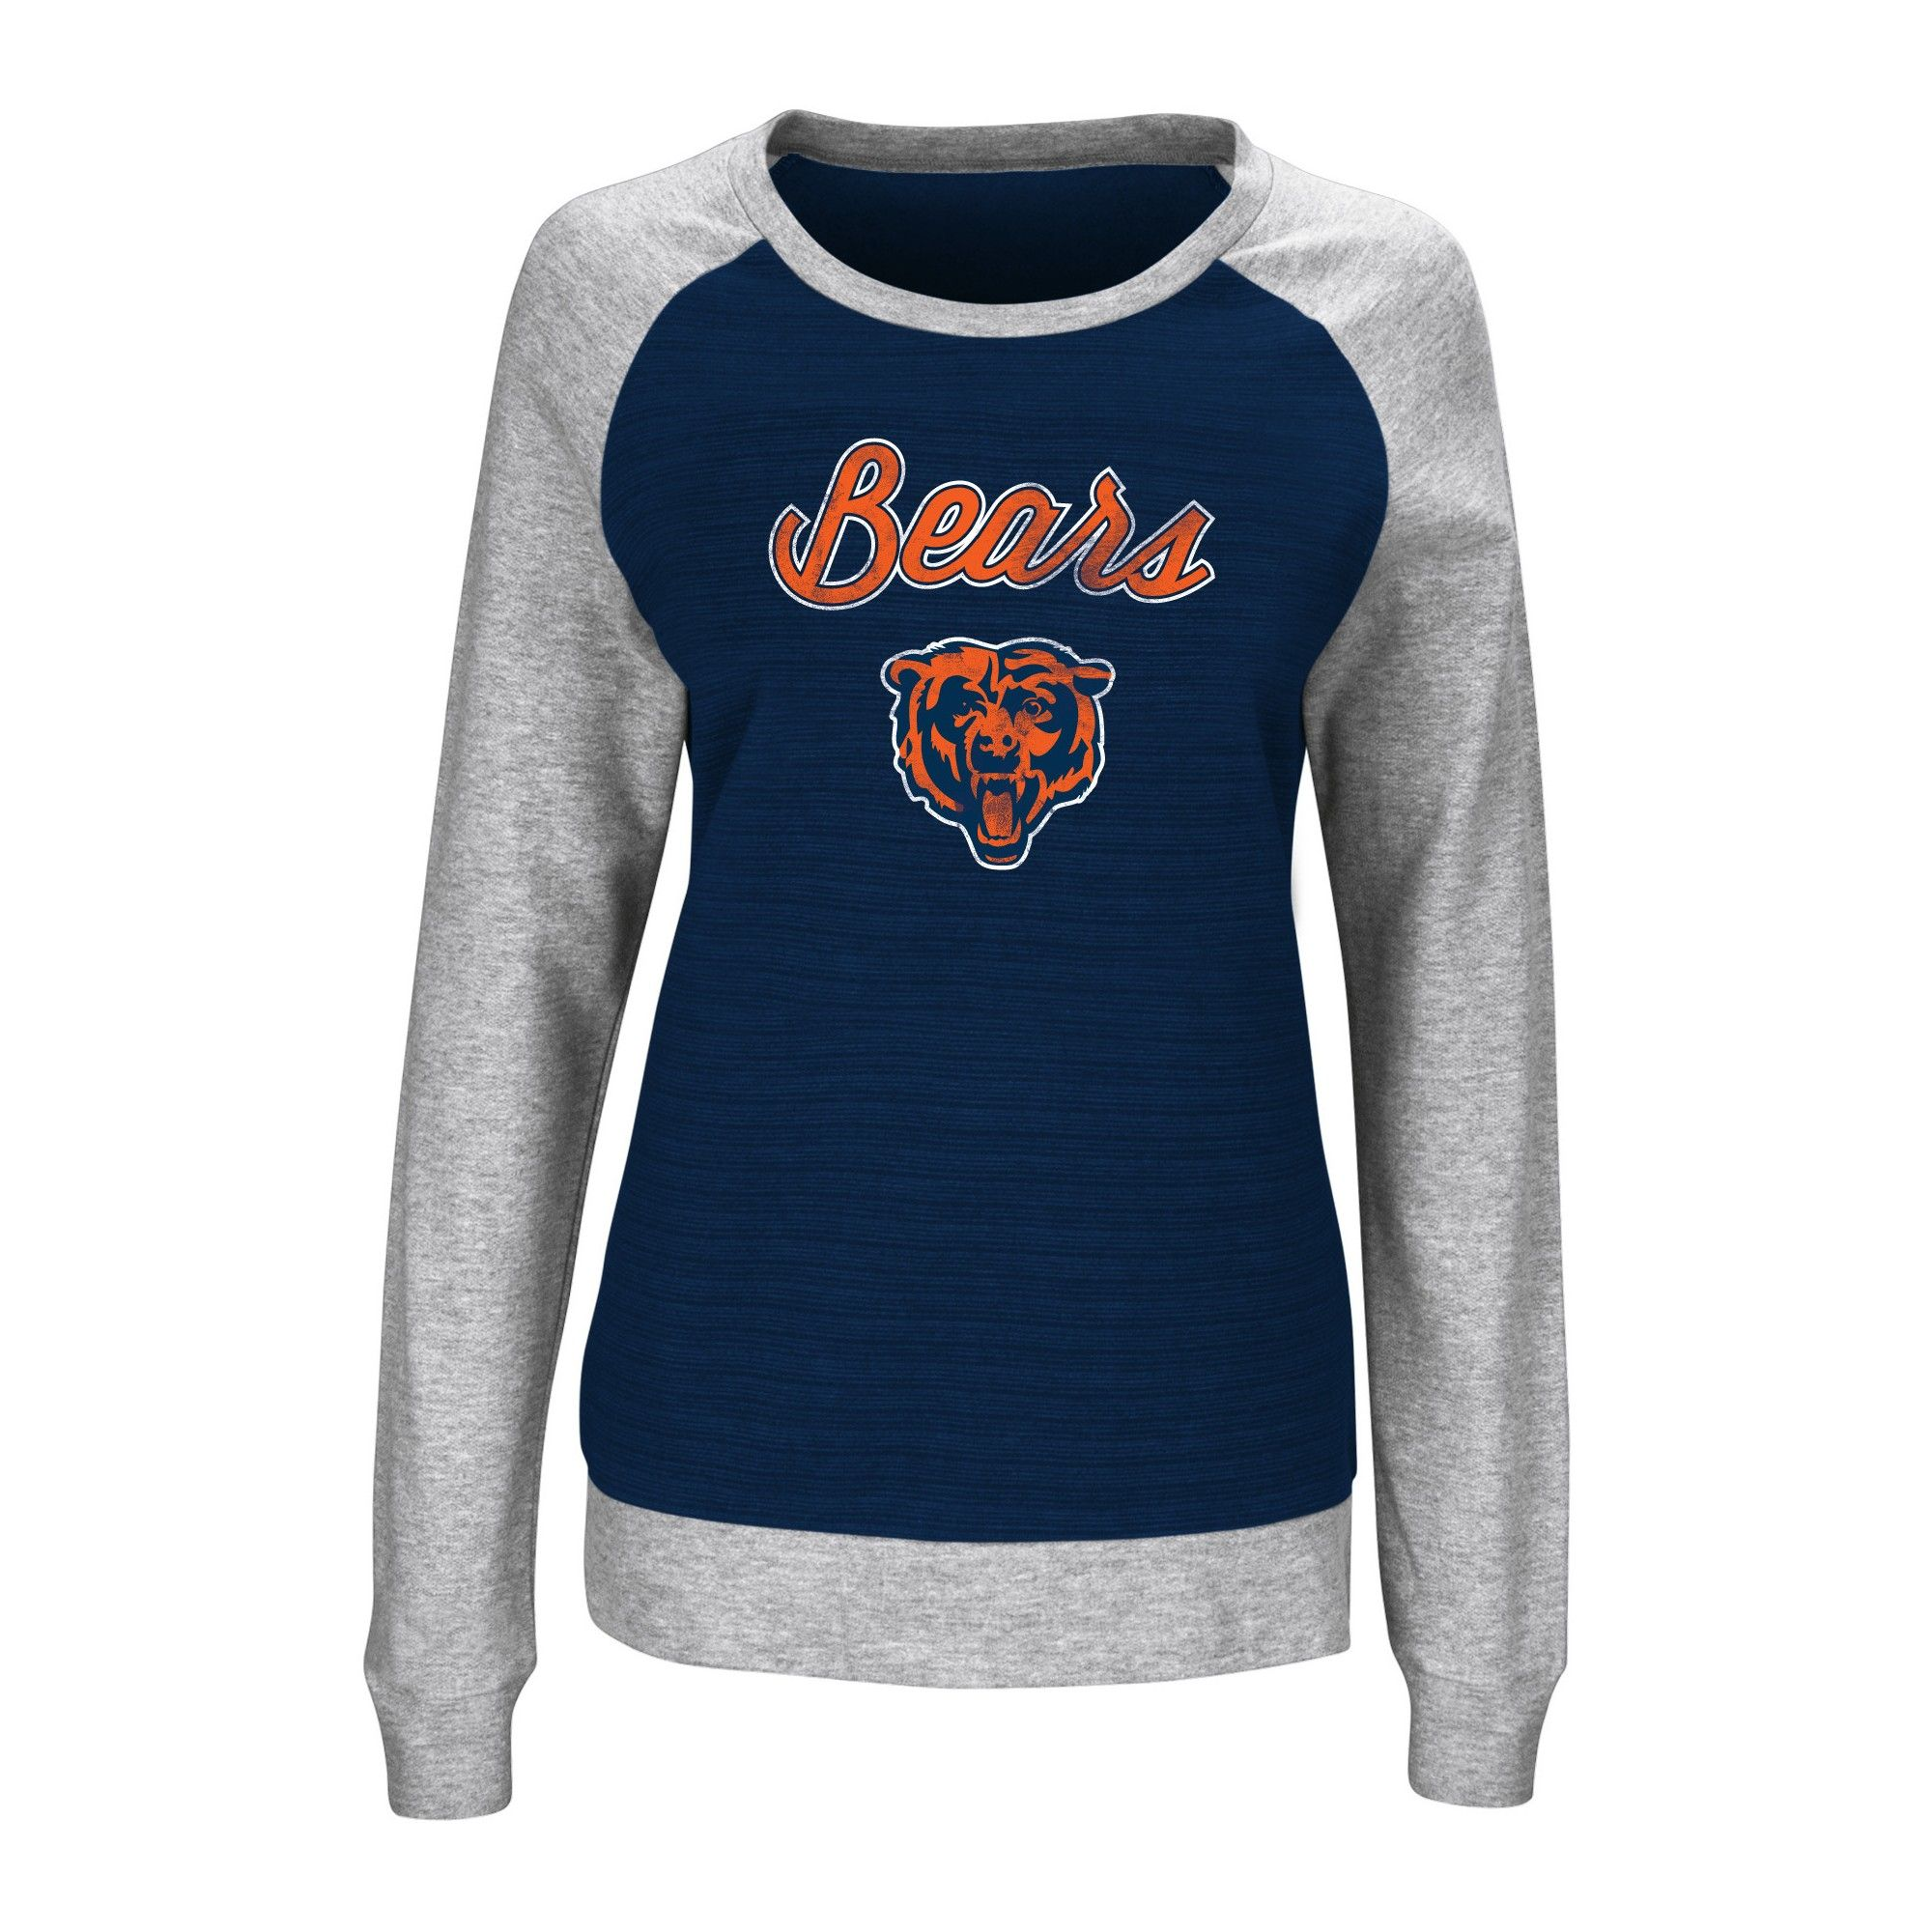 pretty nice 3acaa c9943 Chicago Bears Sweatshirt Xxl, Women's, Gray Multicolored ...